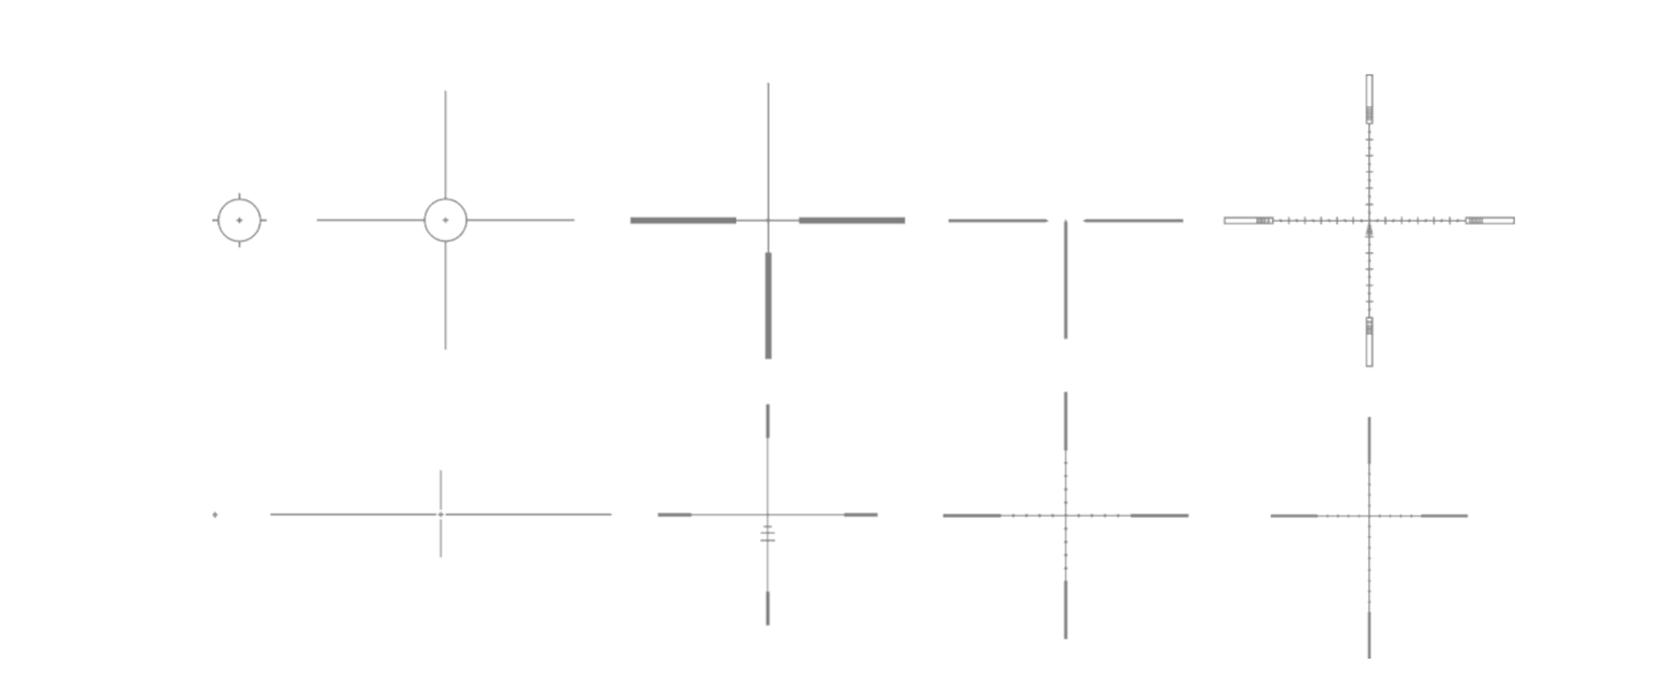 Pulsar Termal Dürbün: Pulsar TRAIL 2 LRF XP50 Termal Dürbün